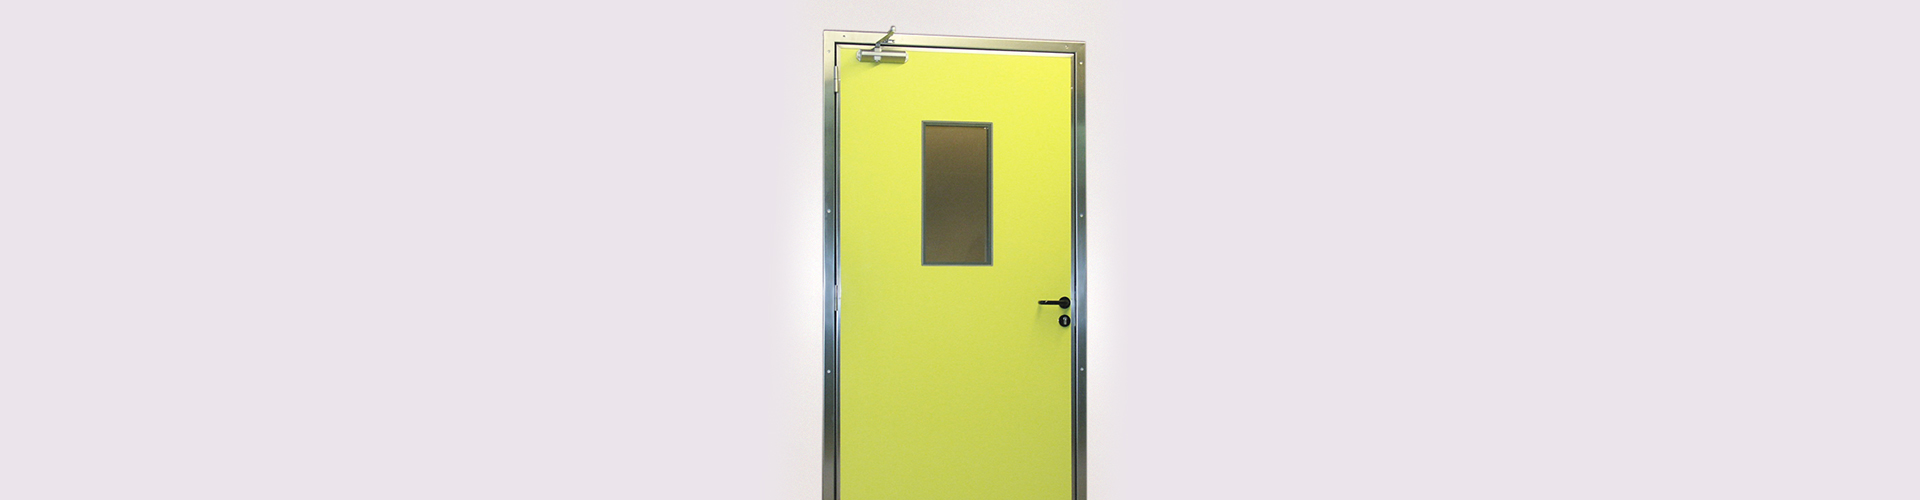 porte de service jaune semi-isotherme SPENLE